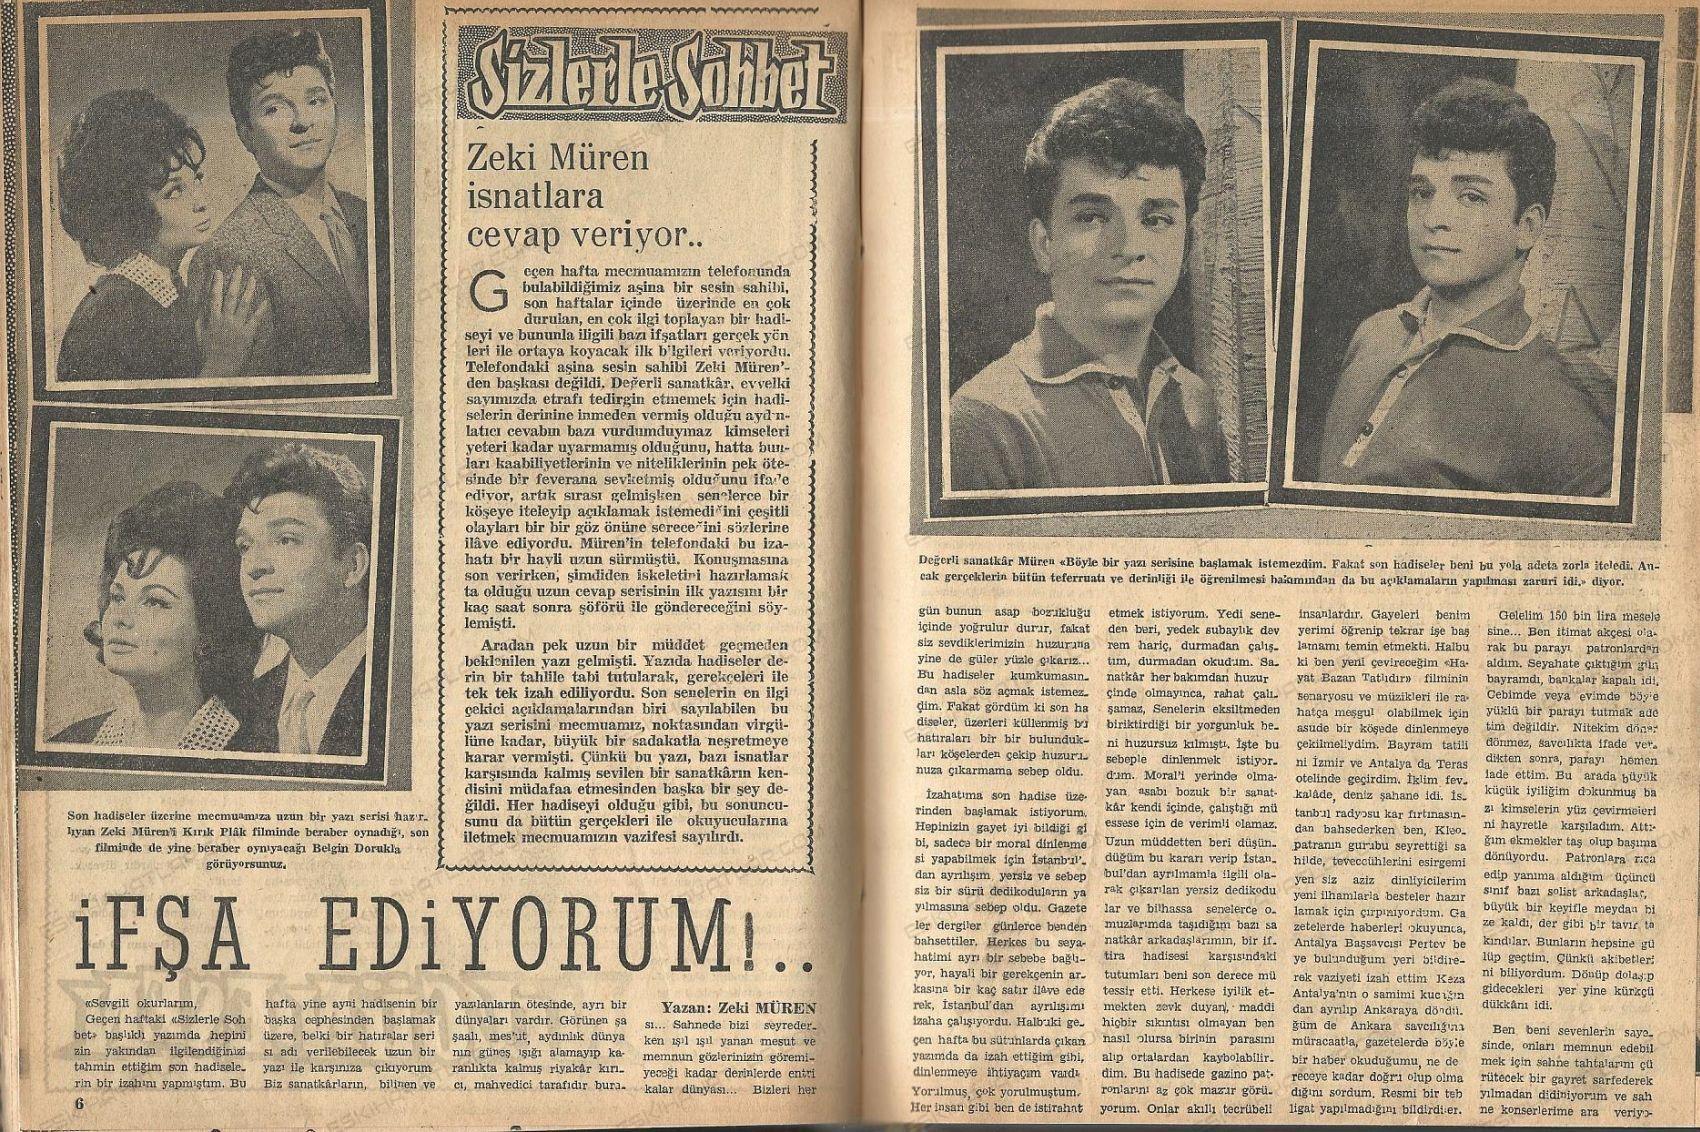 0489-artist-dergisi-1962-arsivi-foto-stil-zeki-muren-haberleri-colpan-ilhan (2)